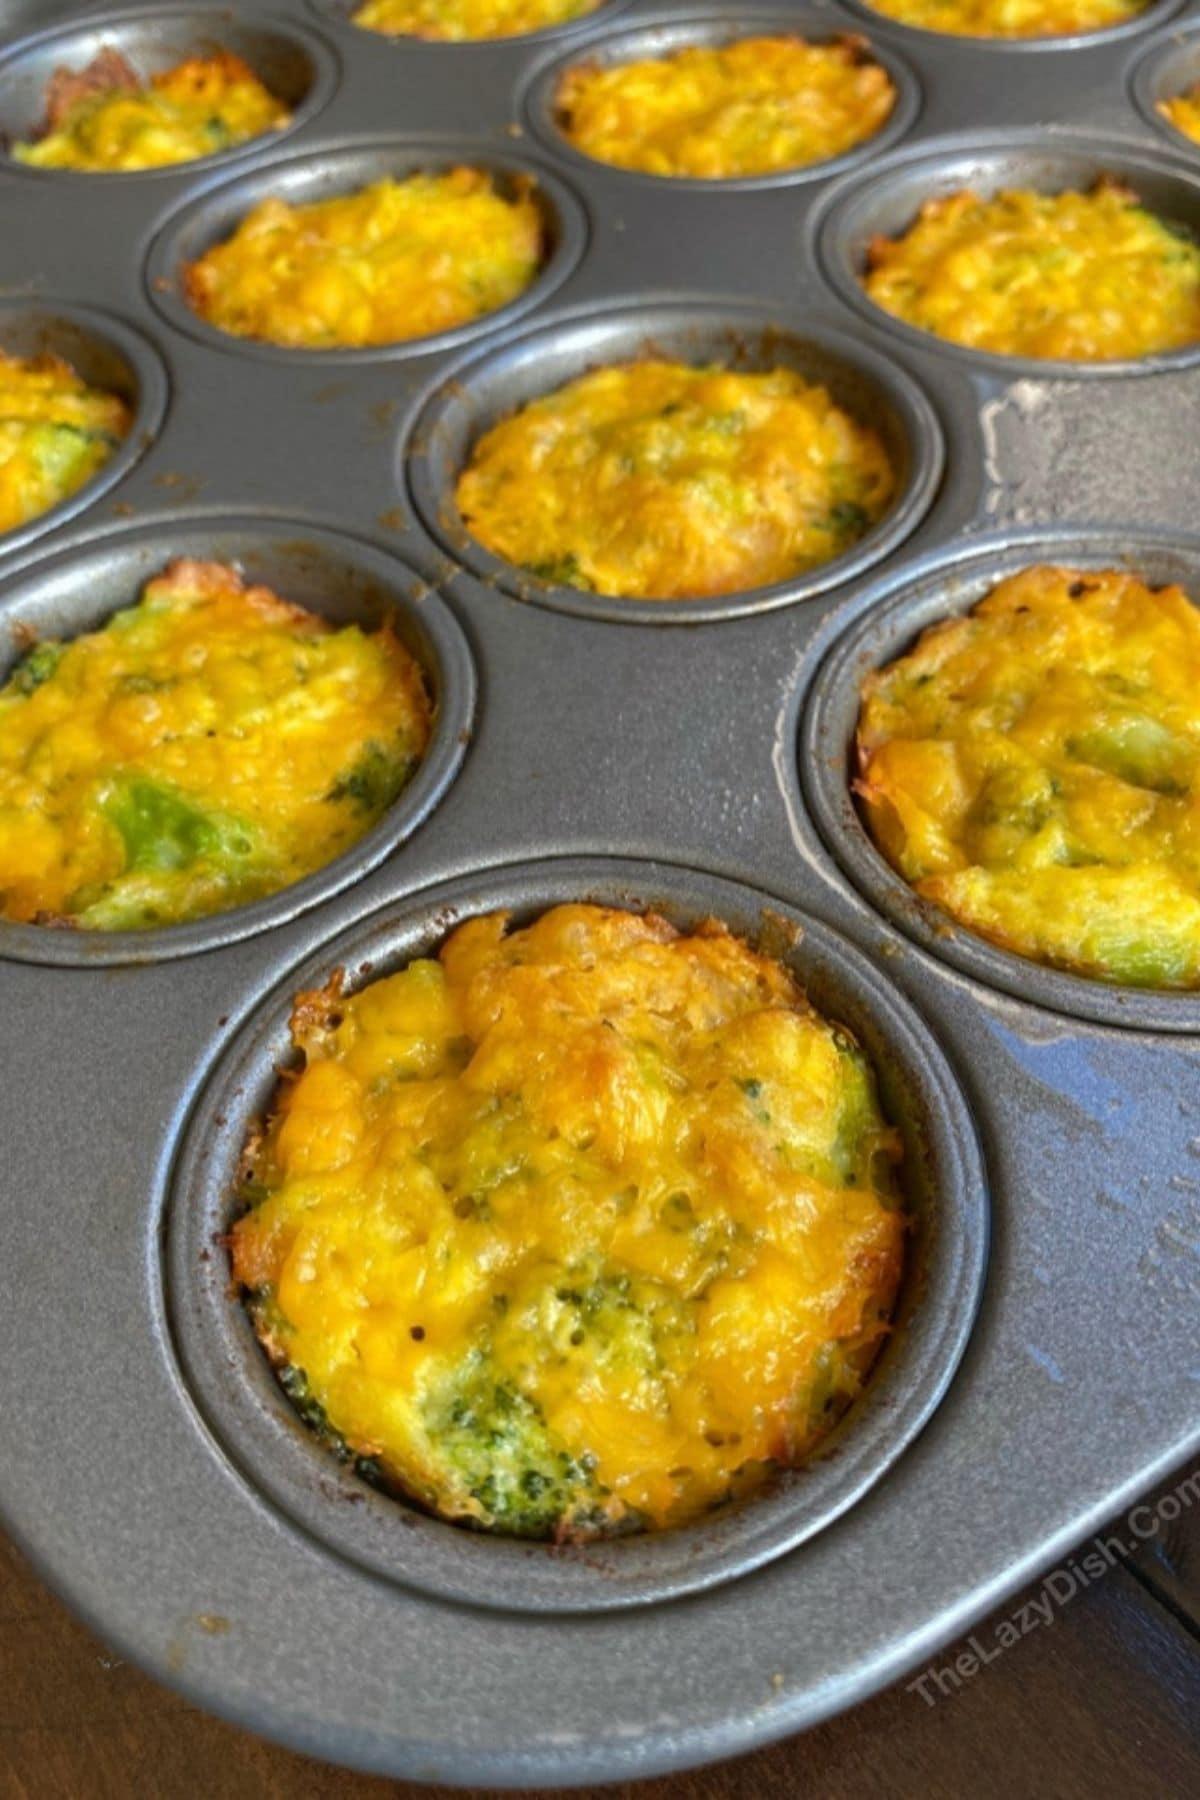 Broccoli cheese muffins in muffin tin